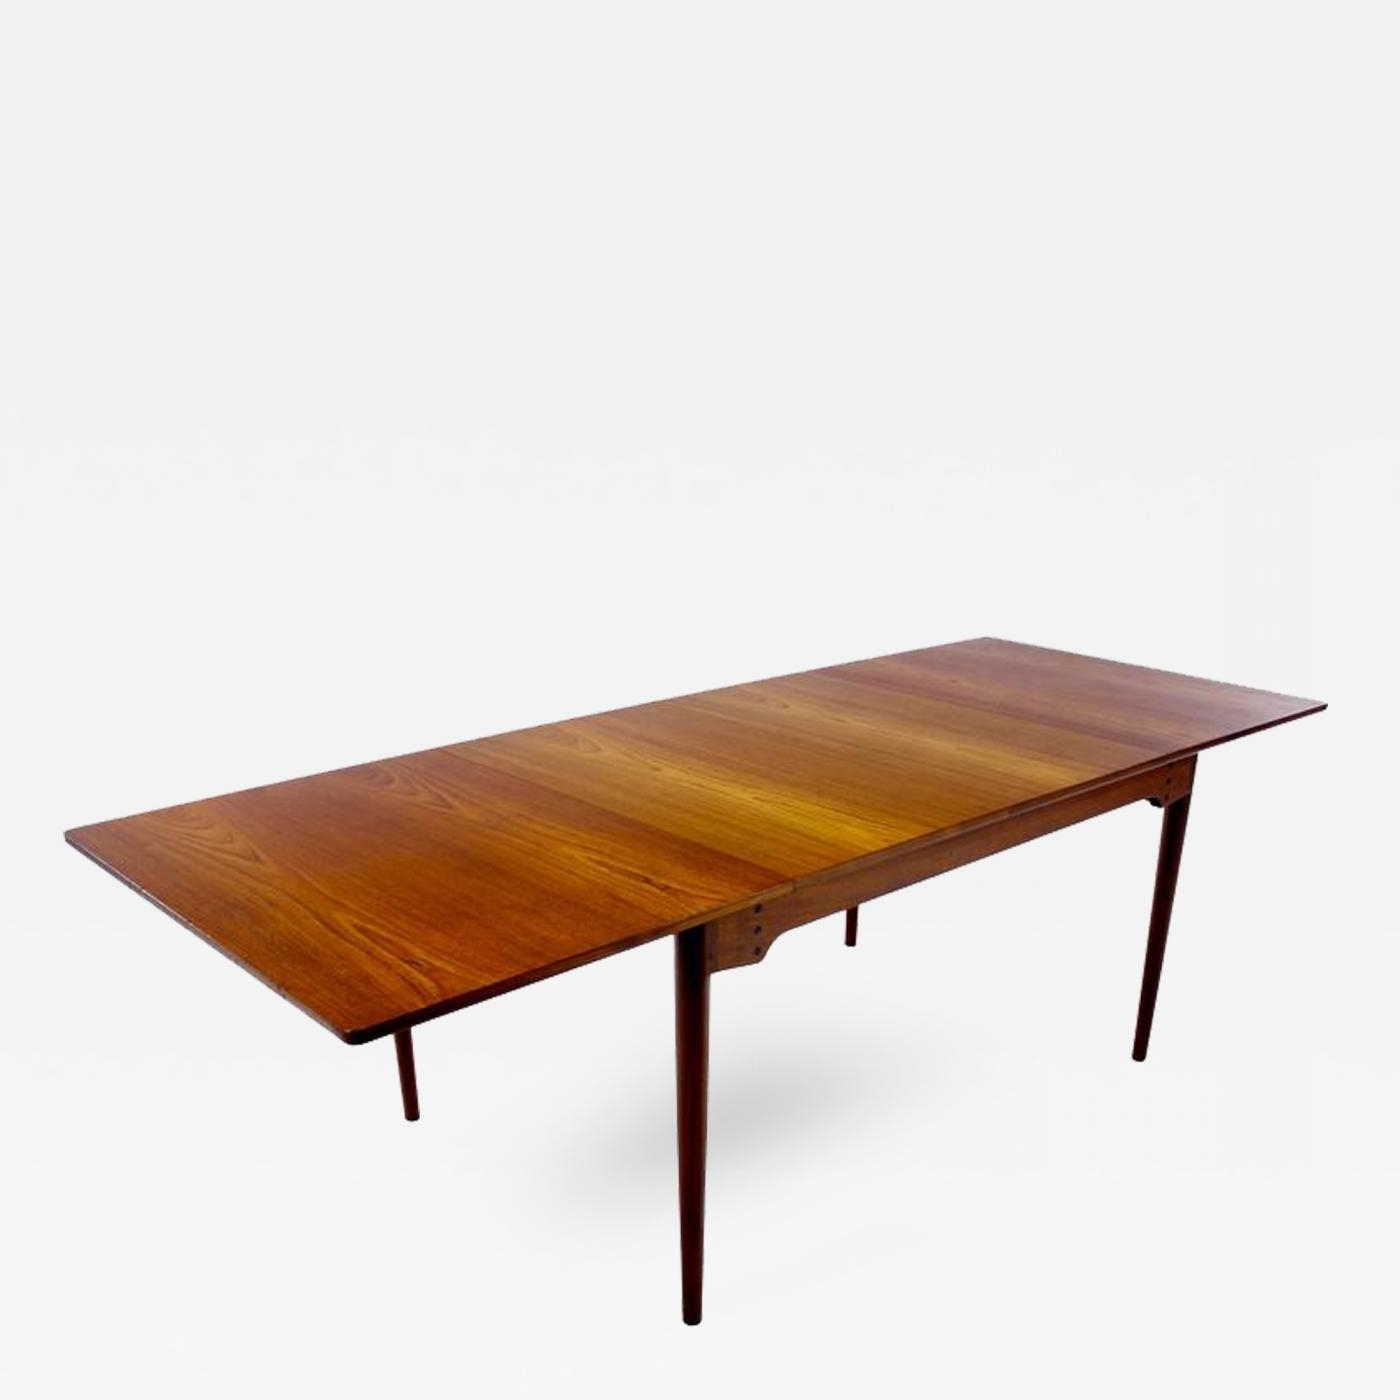 Finn Juhl – Danish Modern Teak Dining Table Designedfinn Juhl Pertaining To Most Popular Danish Dining Tables (View 15 of 25)